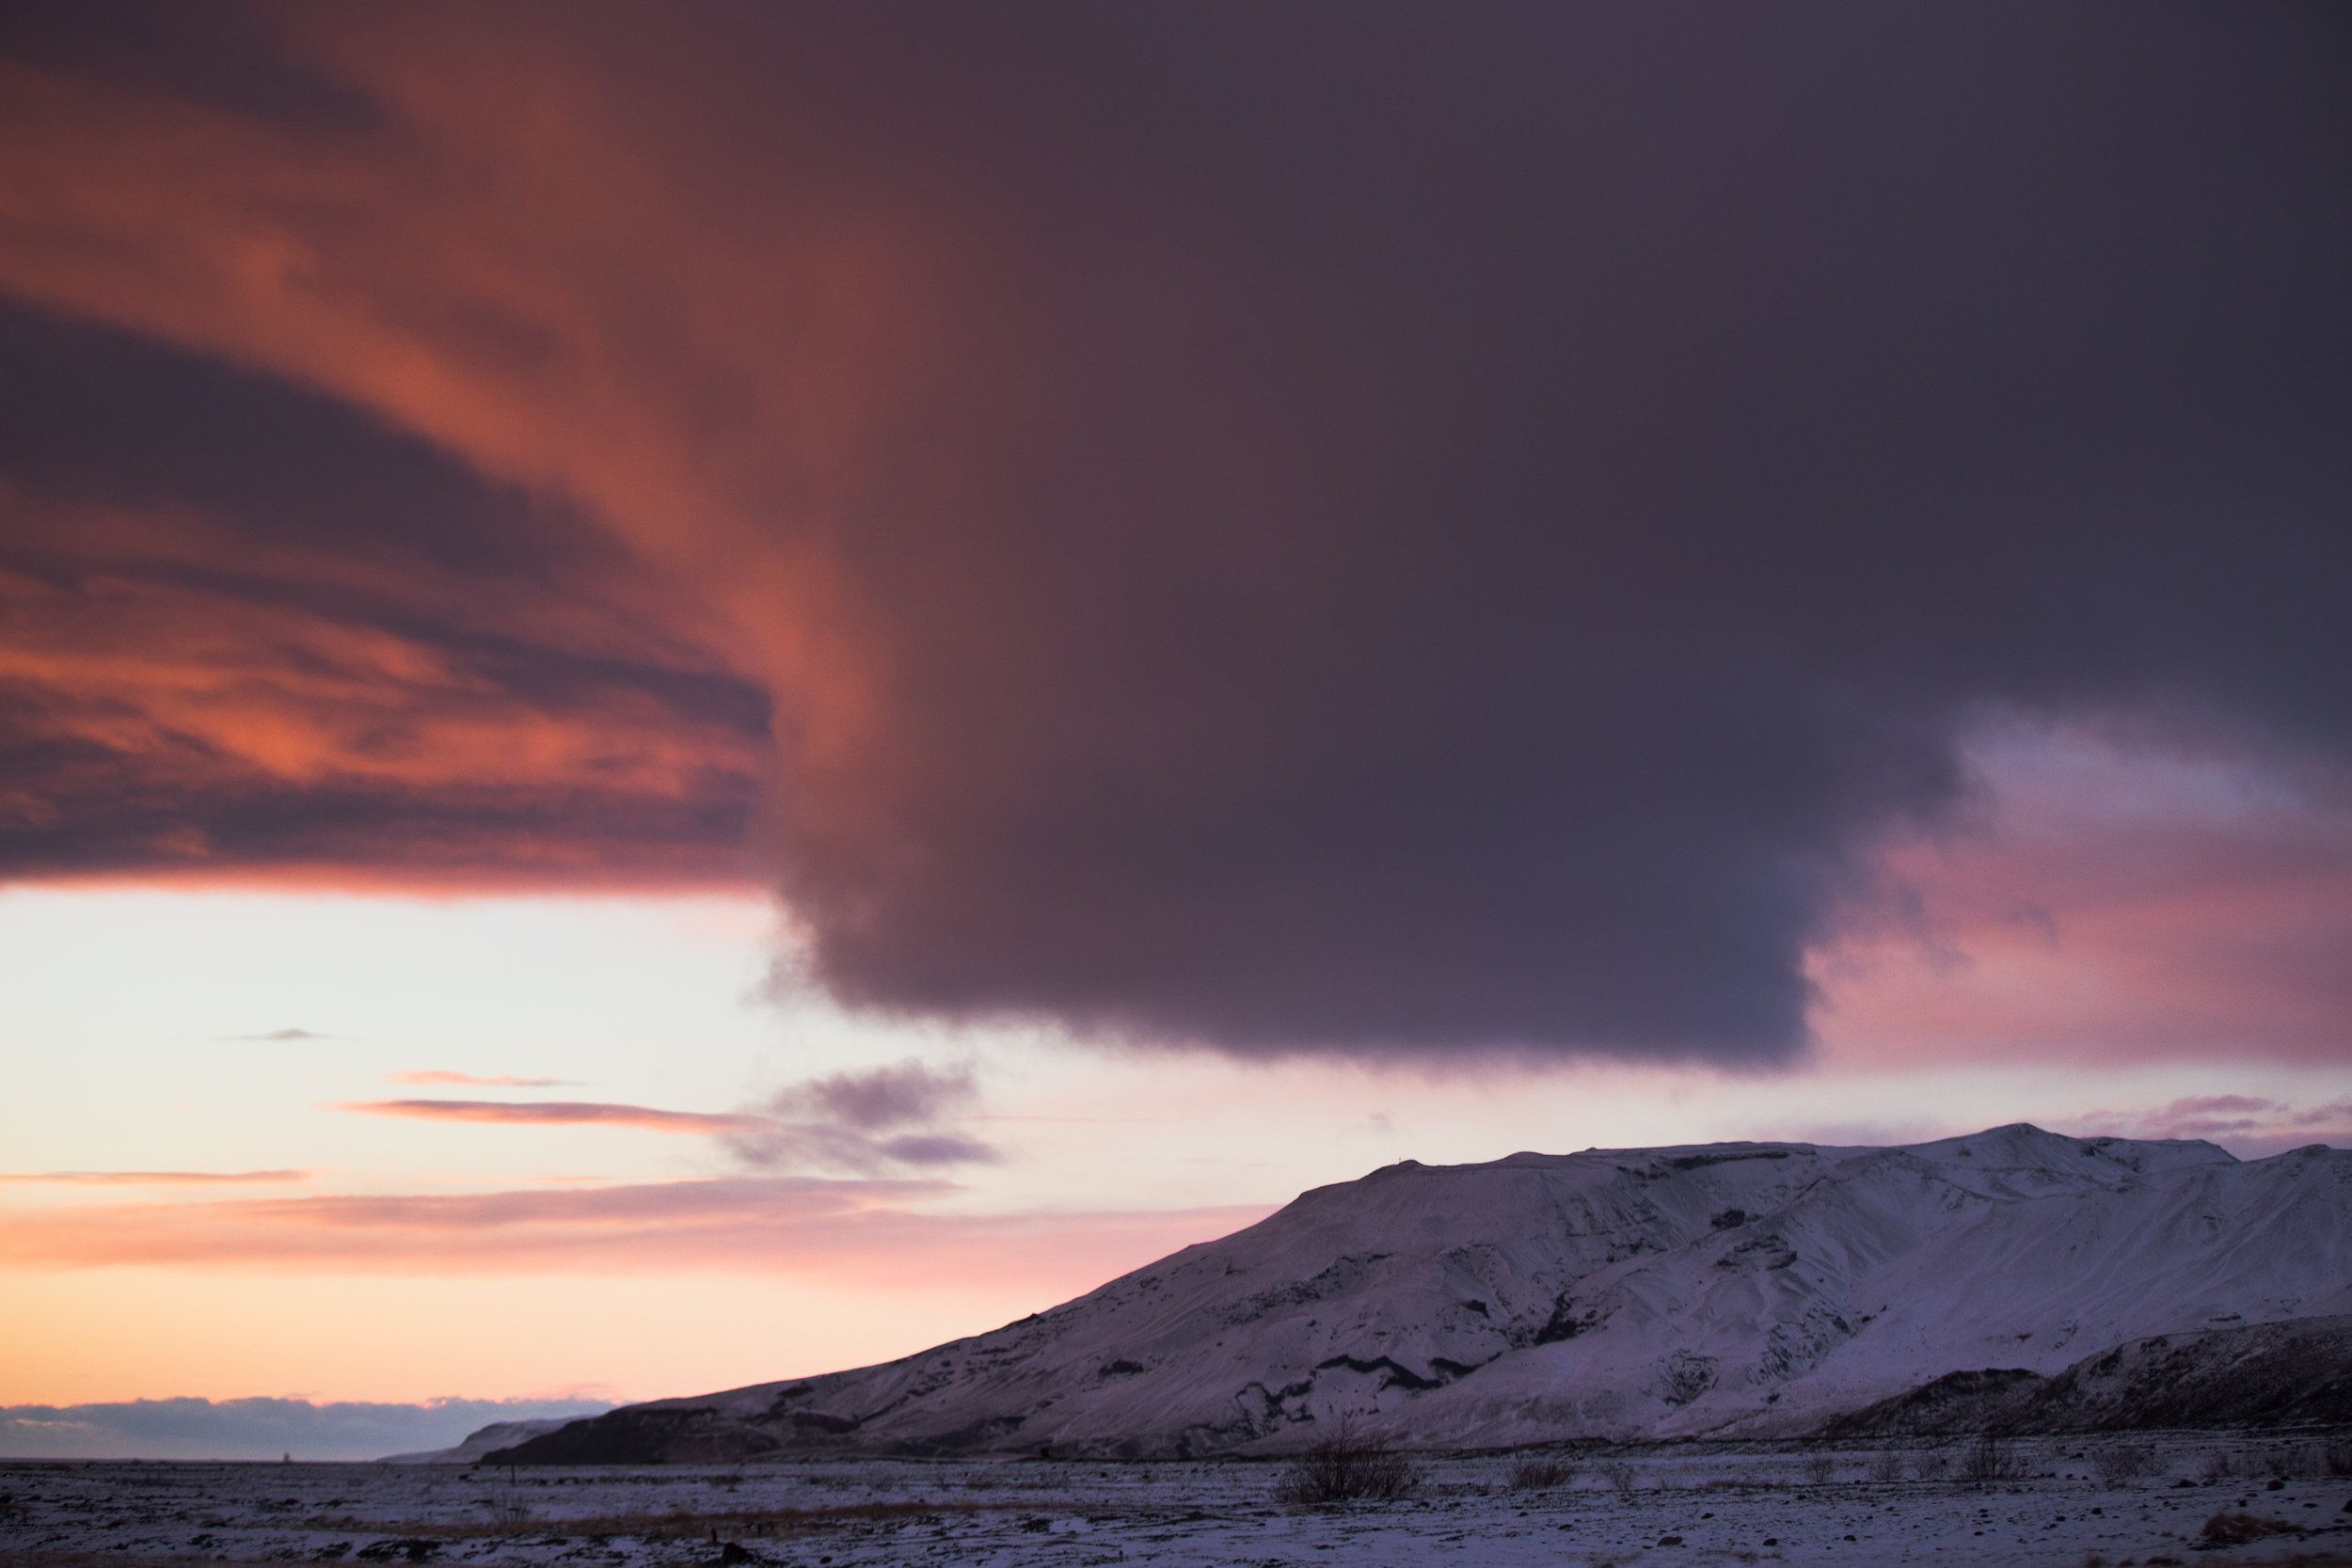 jermiah-schuster-iceland-167.jpg